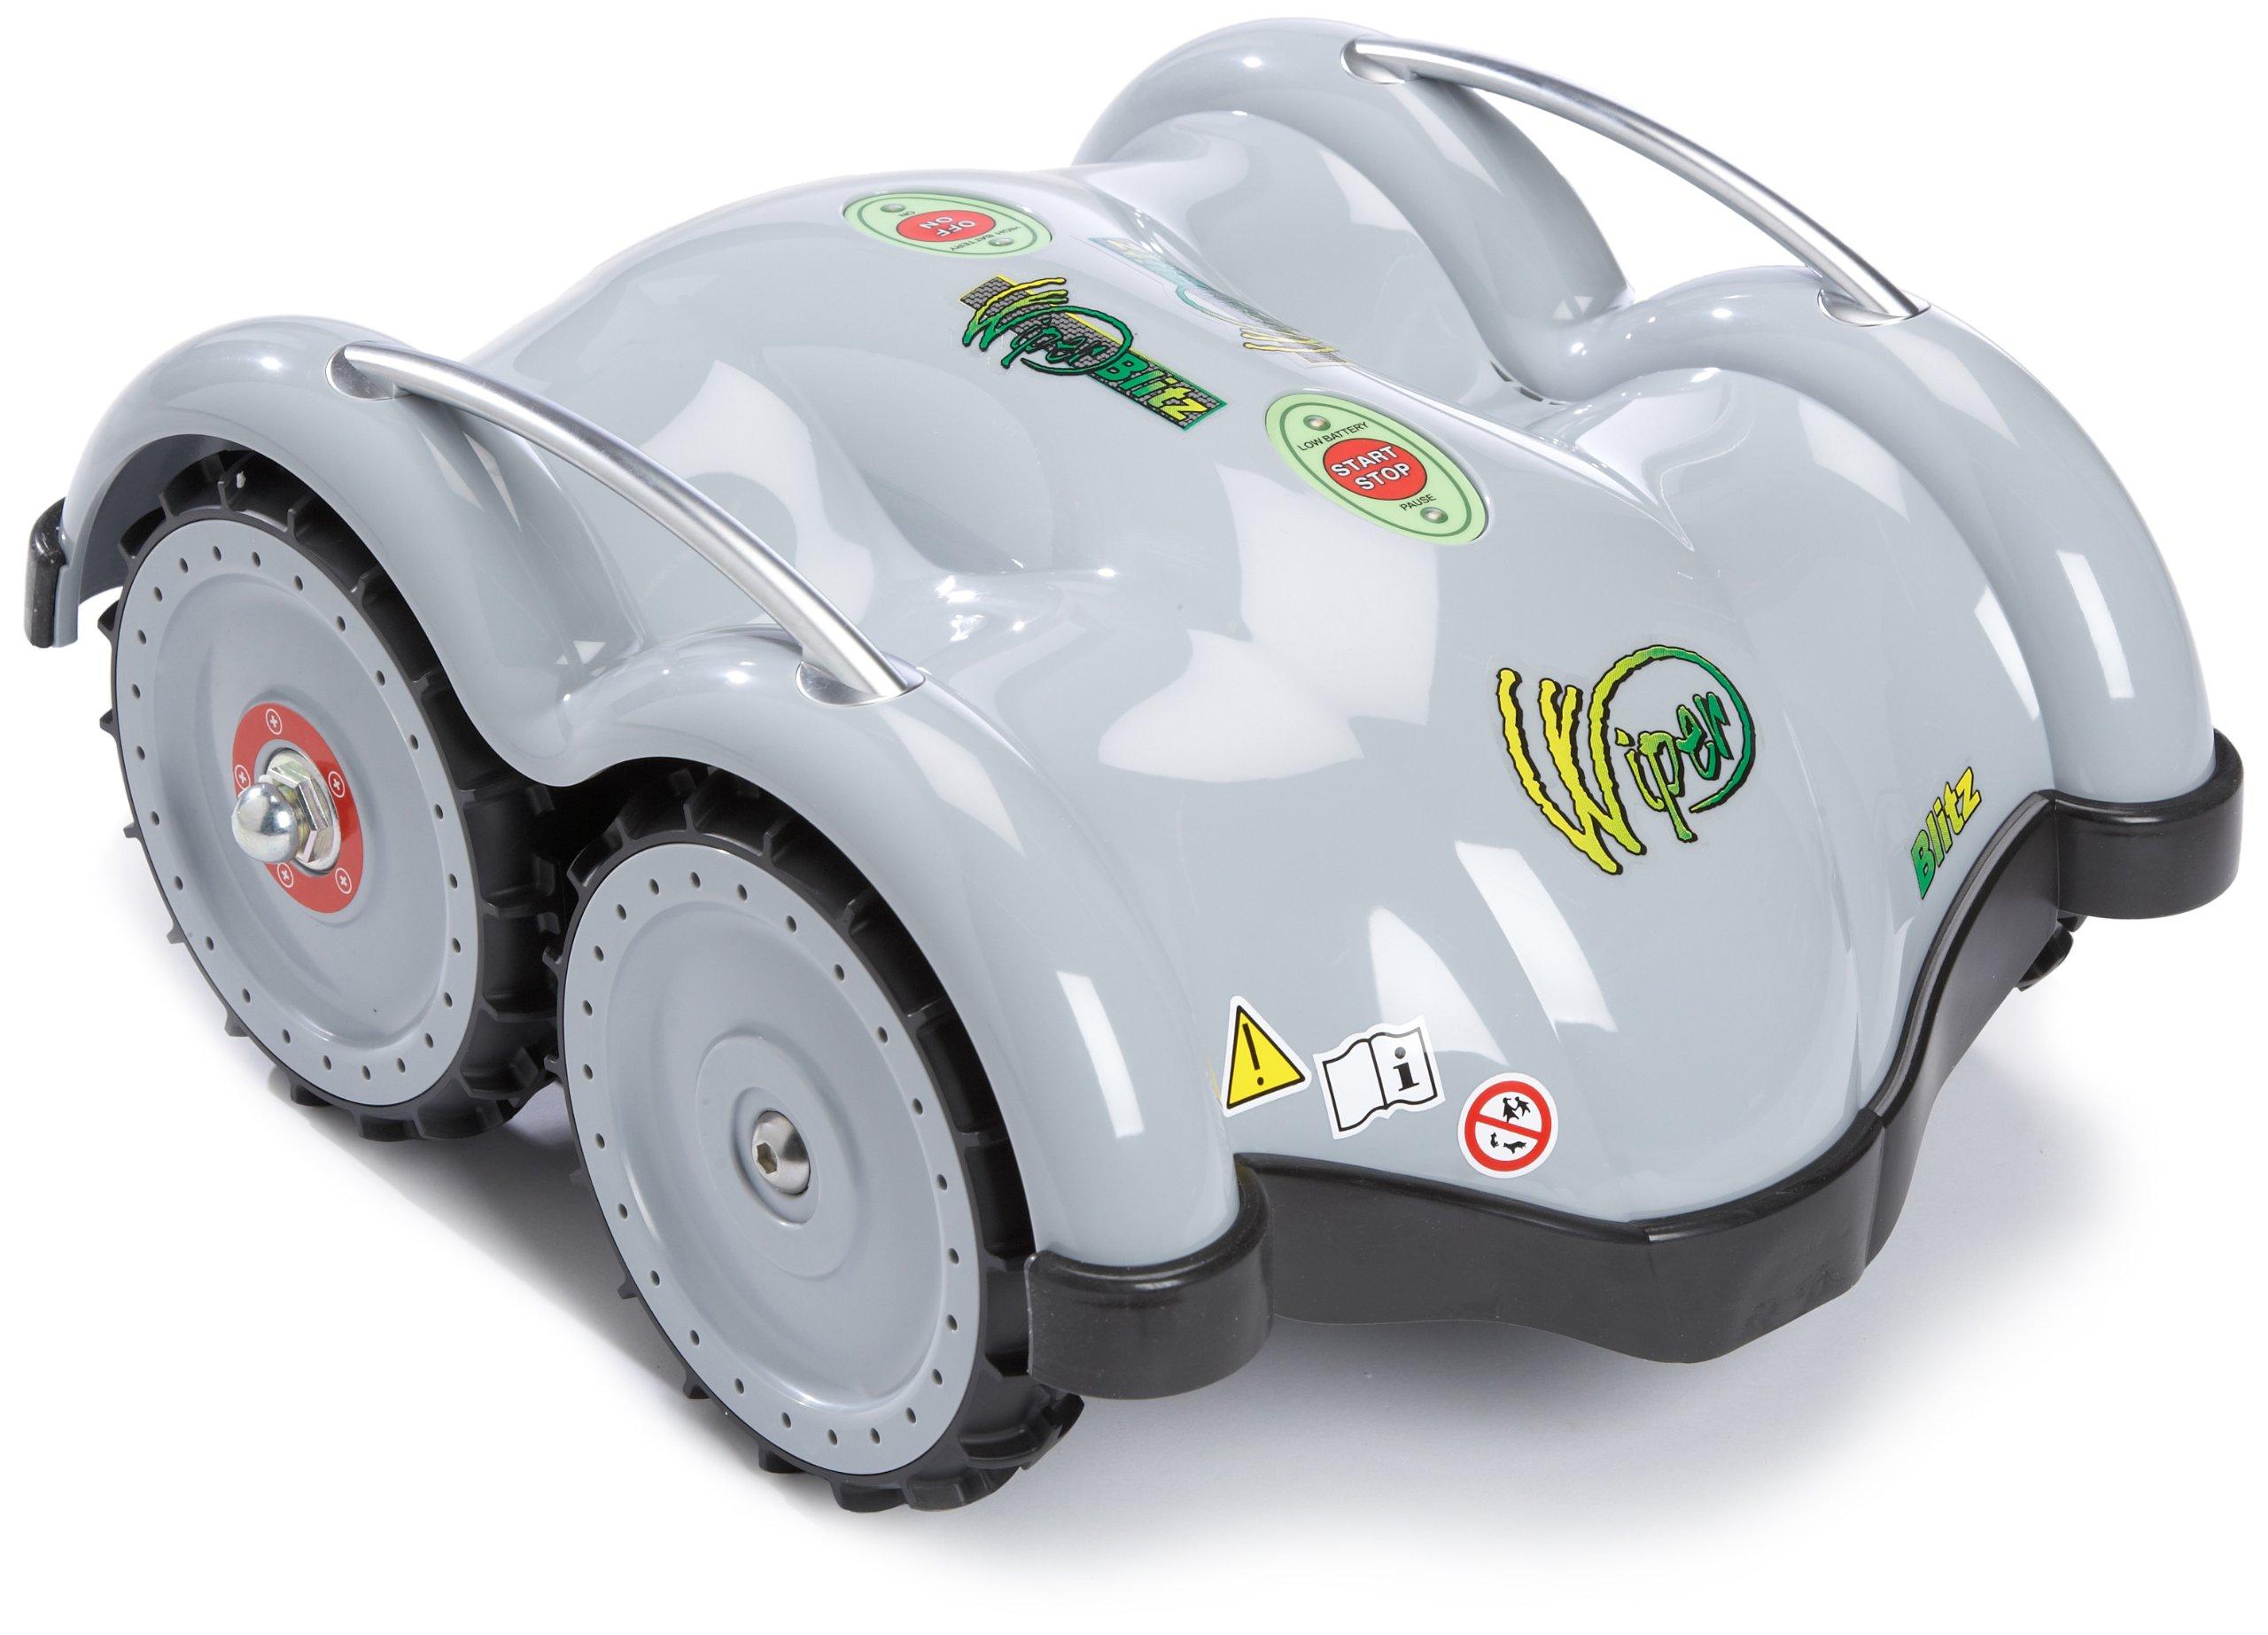 Zucchetti-W08Blitz-Wiper-Robot-Blitz-4WD-Rasenmher-Roboter